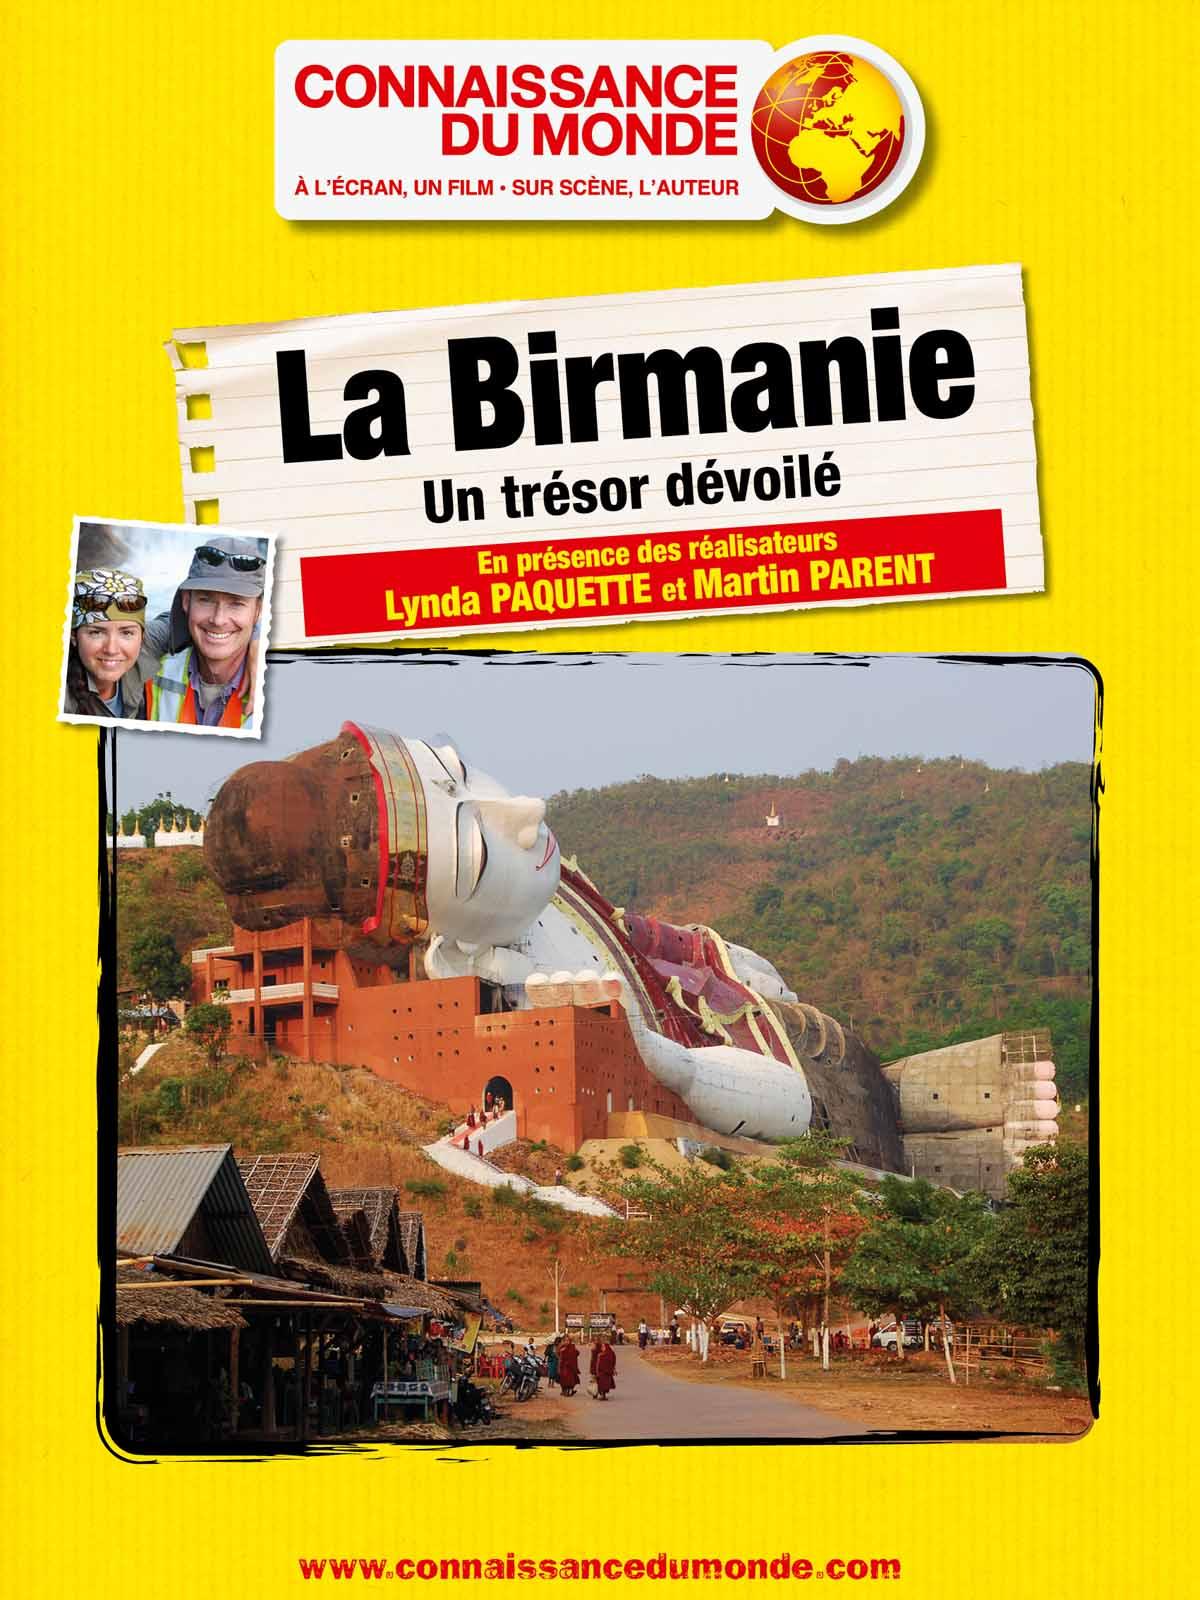 La Birmanie, Un trésor dévoilé